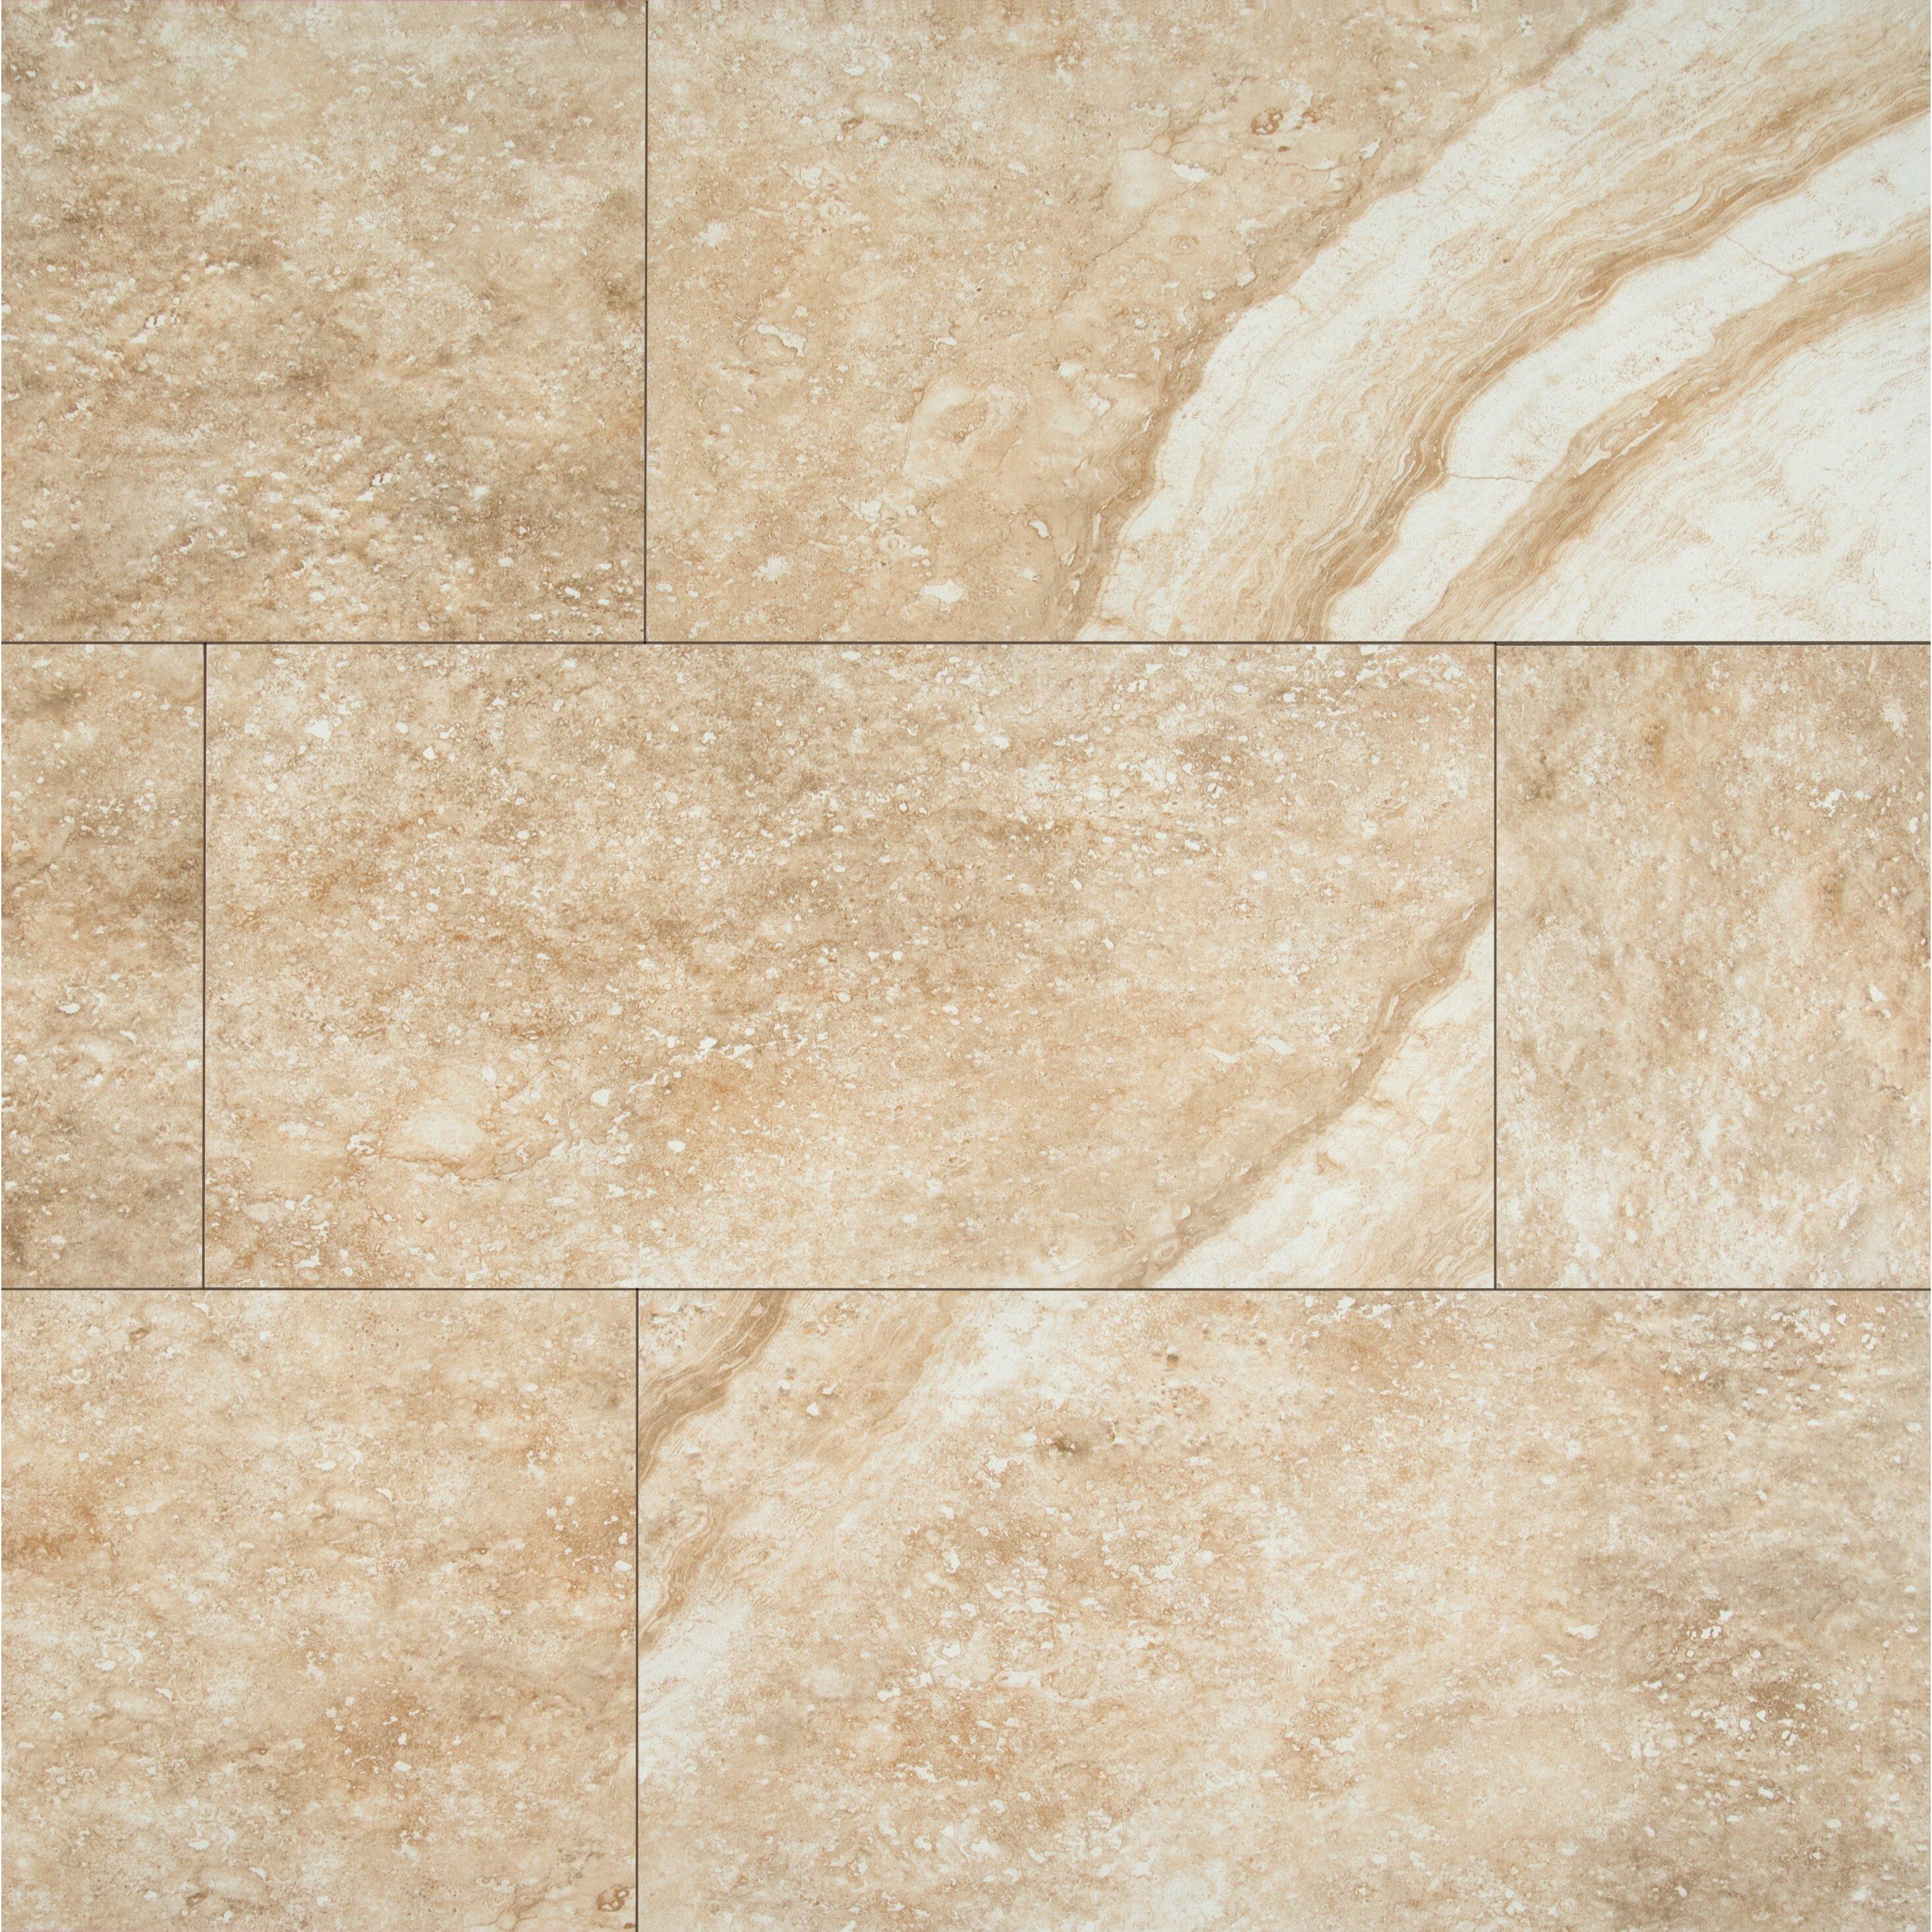 Msi aliso 12 x 24 ceramic subway tile in beige wayfair for 12 x 24 glass tile